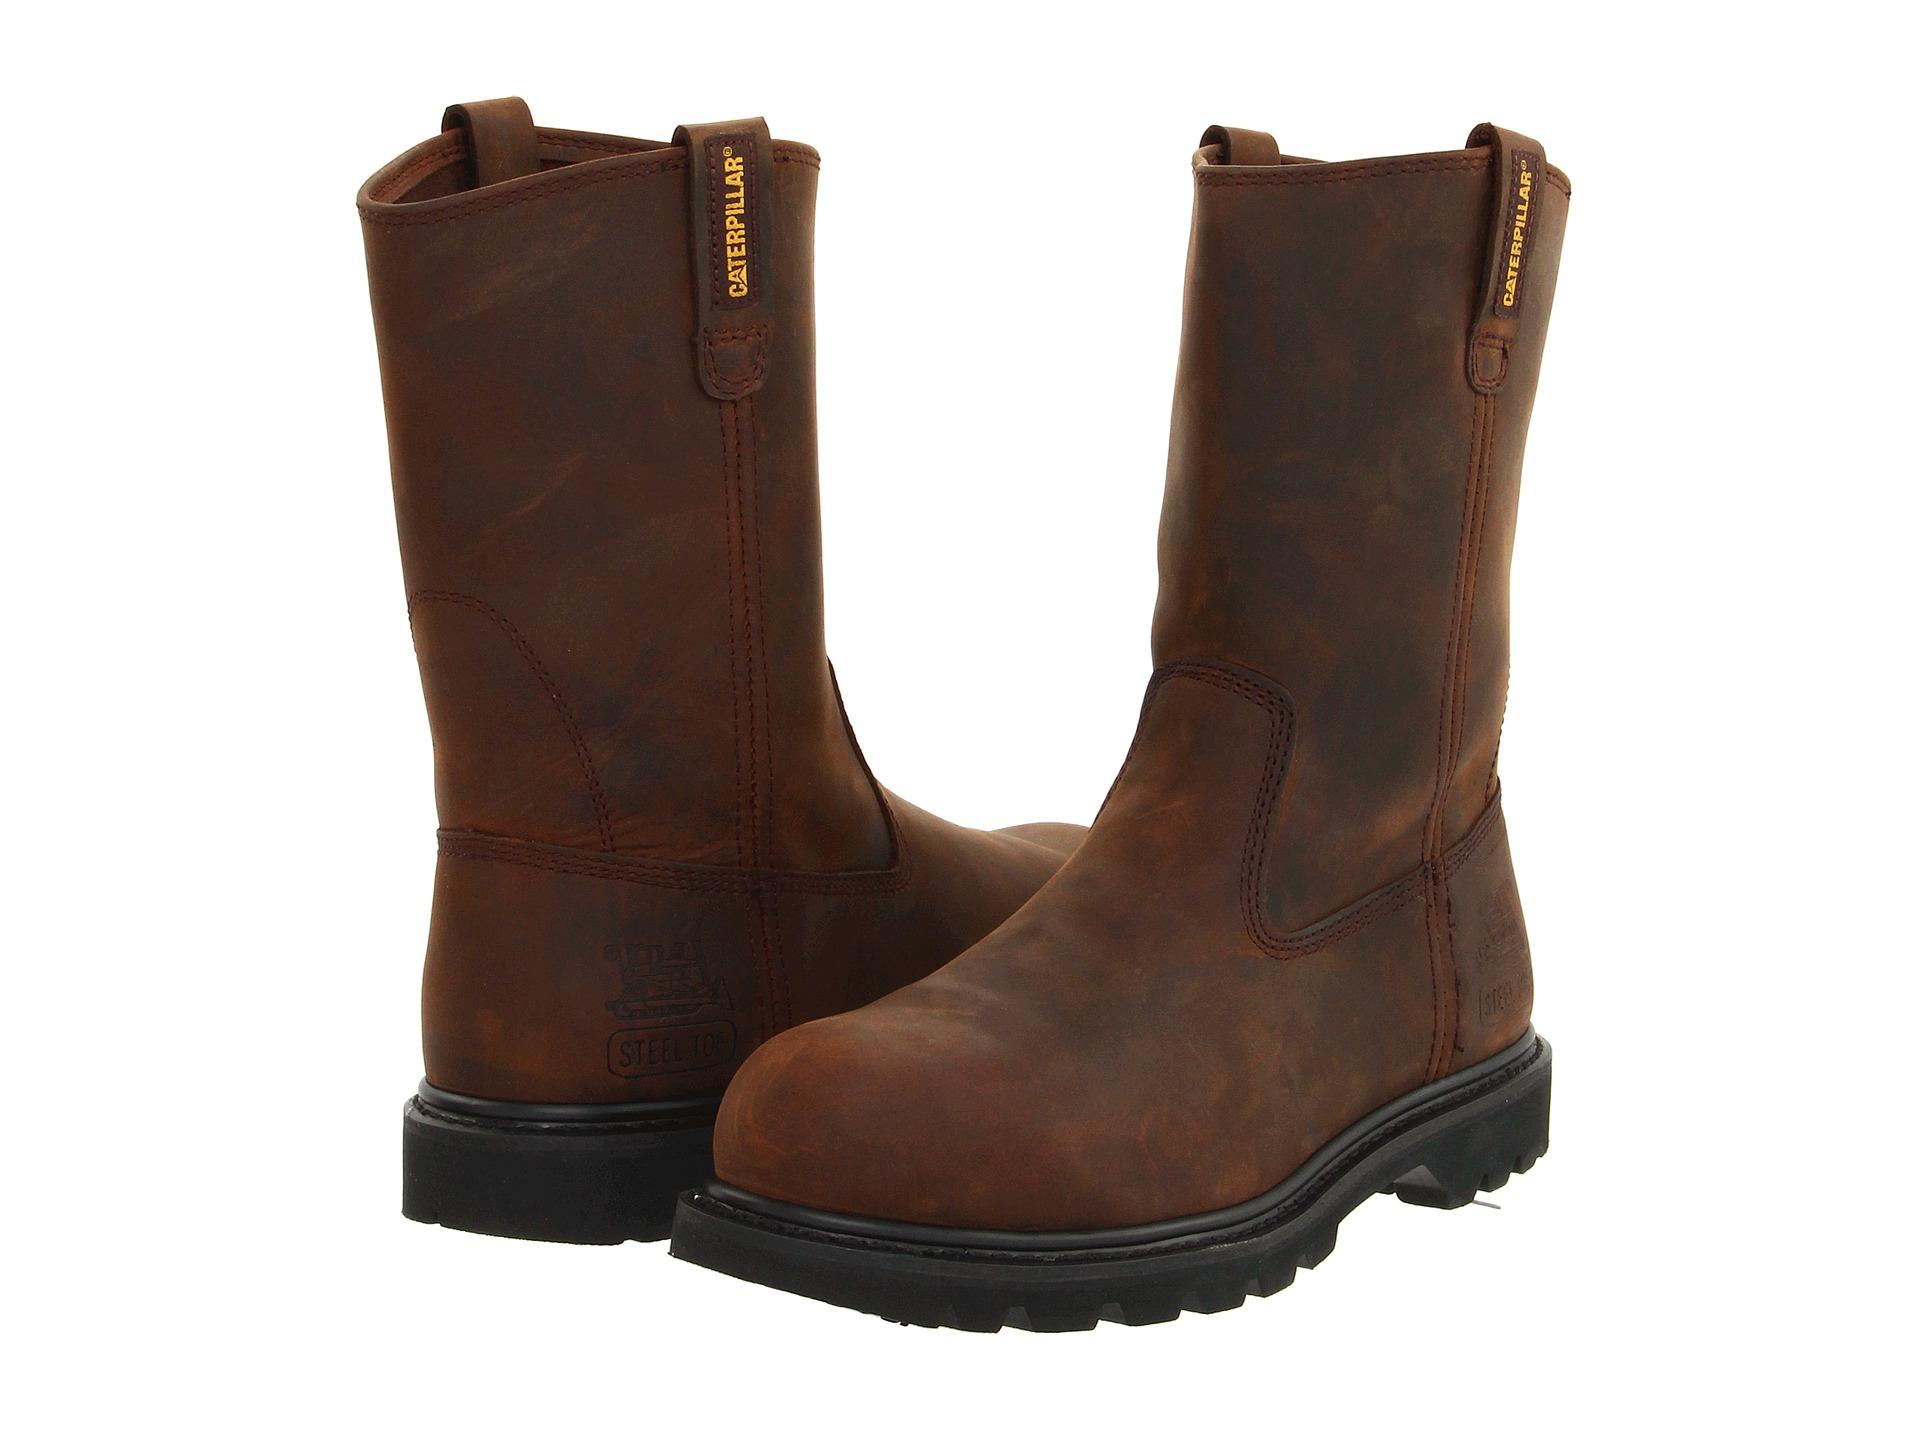 Zappos Womens Steel Toe Shoes